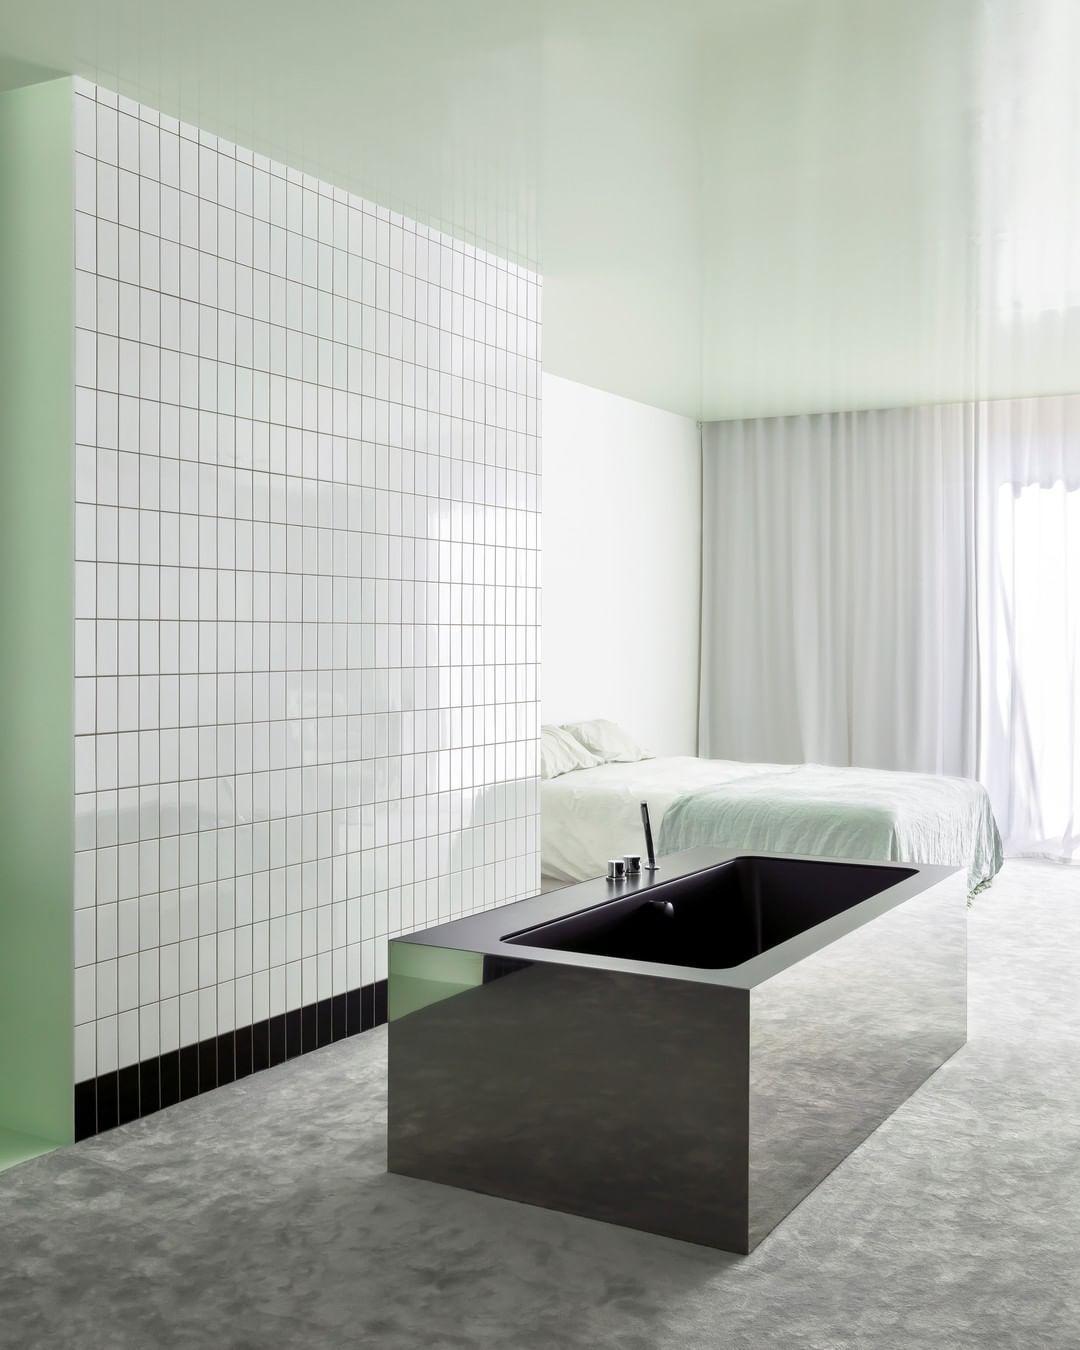 1,728 отметок «Нравится», 8 комментариев — Archilovers (@archilovers) в Instagram: «Apartment A 🧼🧼🧼 Architecture   @atelierdialect  Photography   📷 @piet.albert.goethals . . .…»